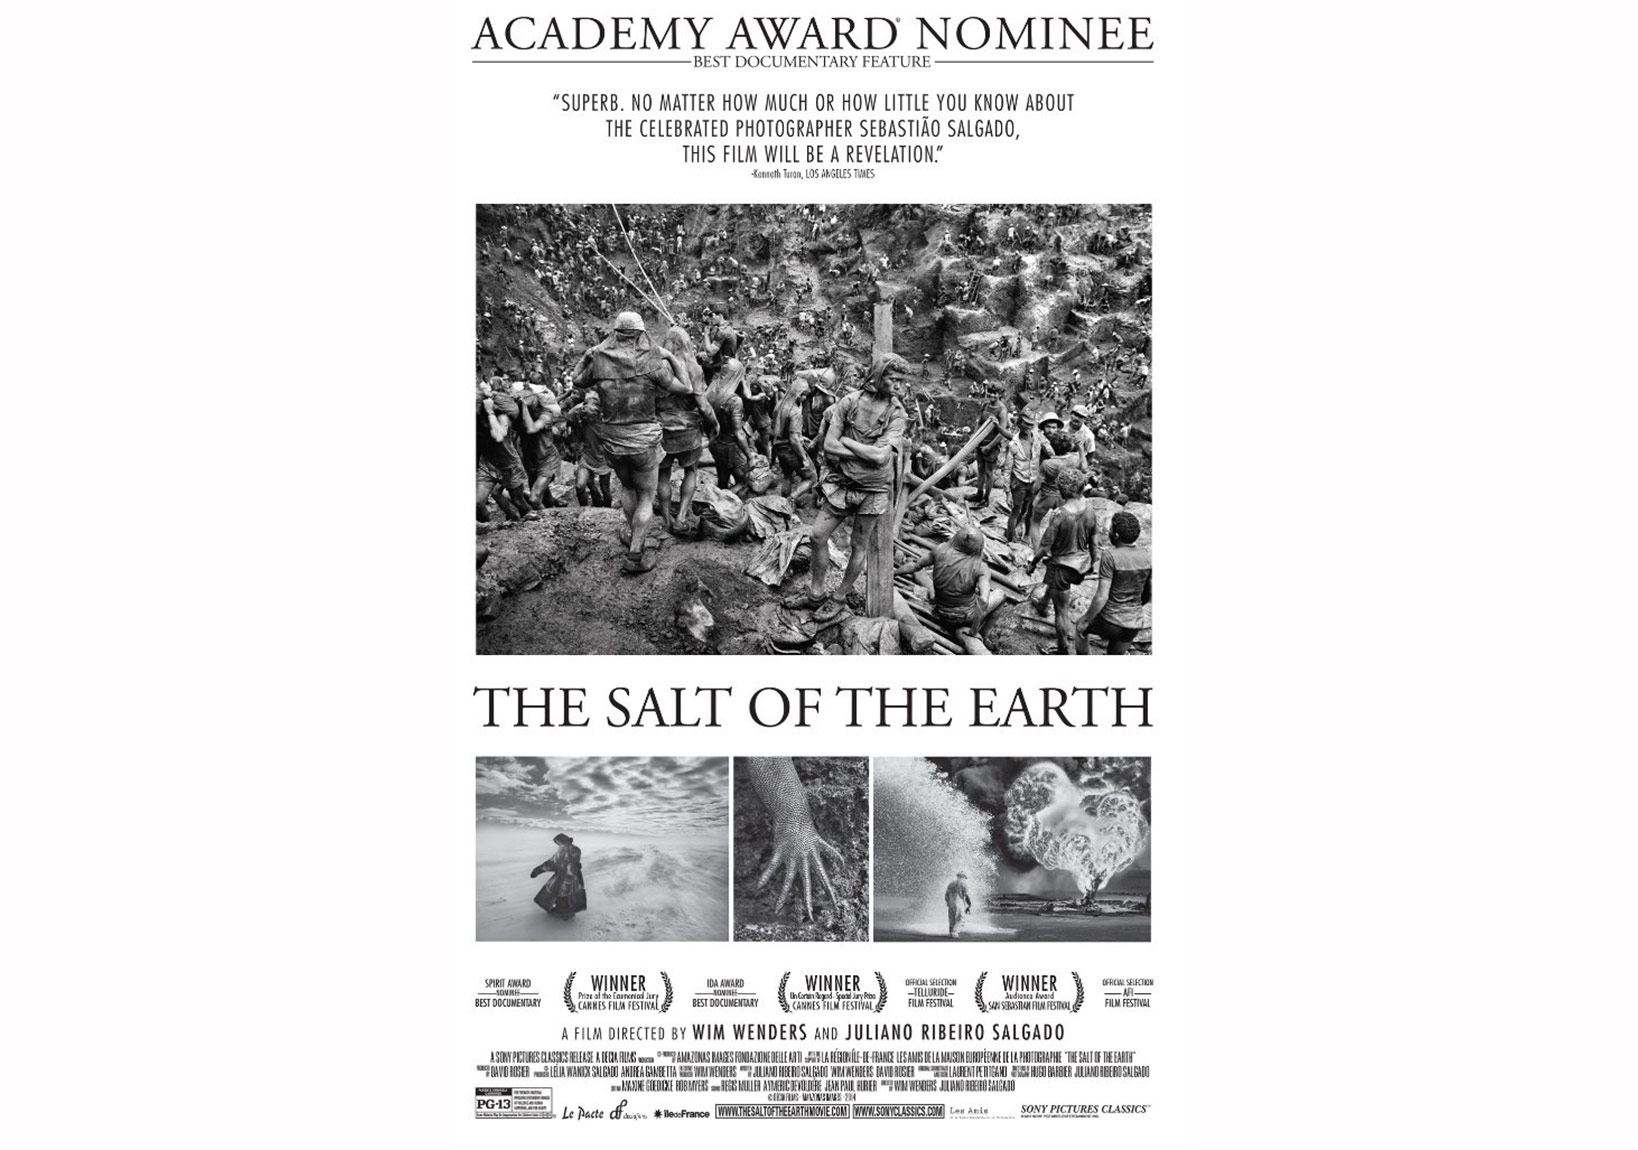 'The Salt of the Earth' ABD afişi